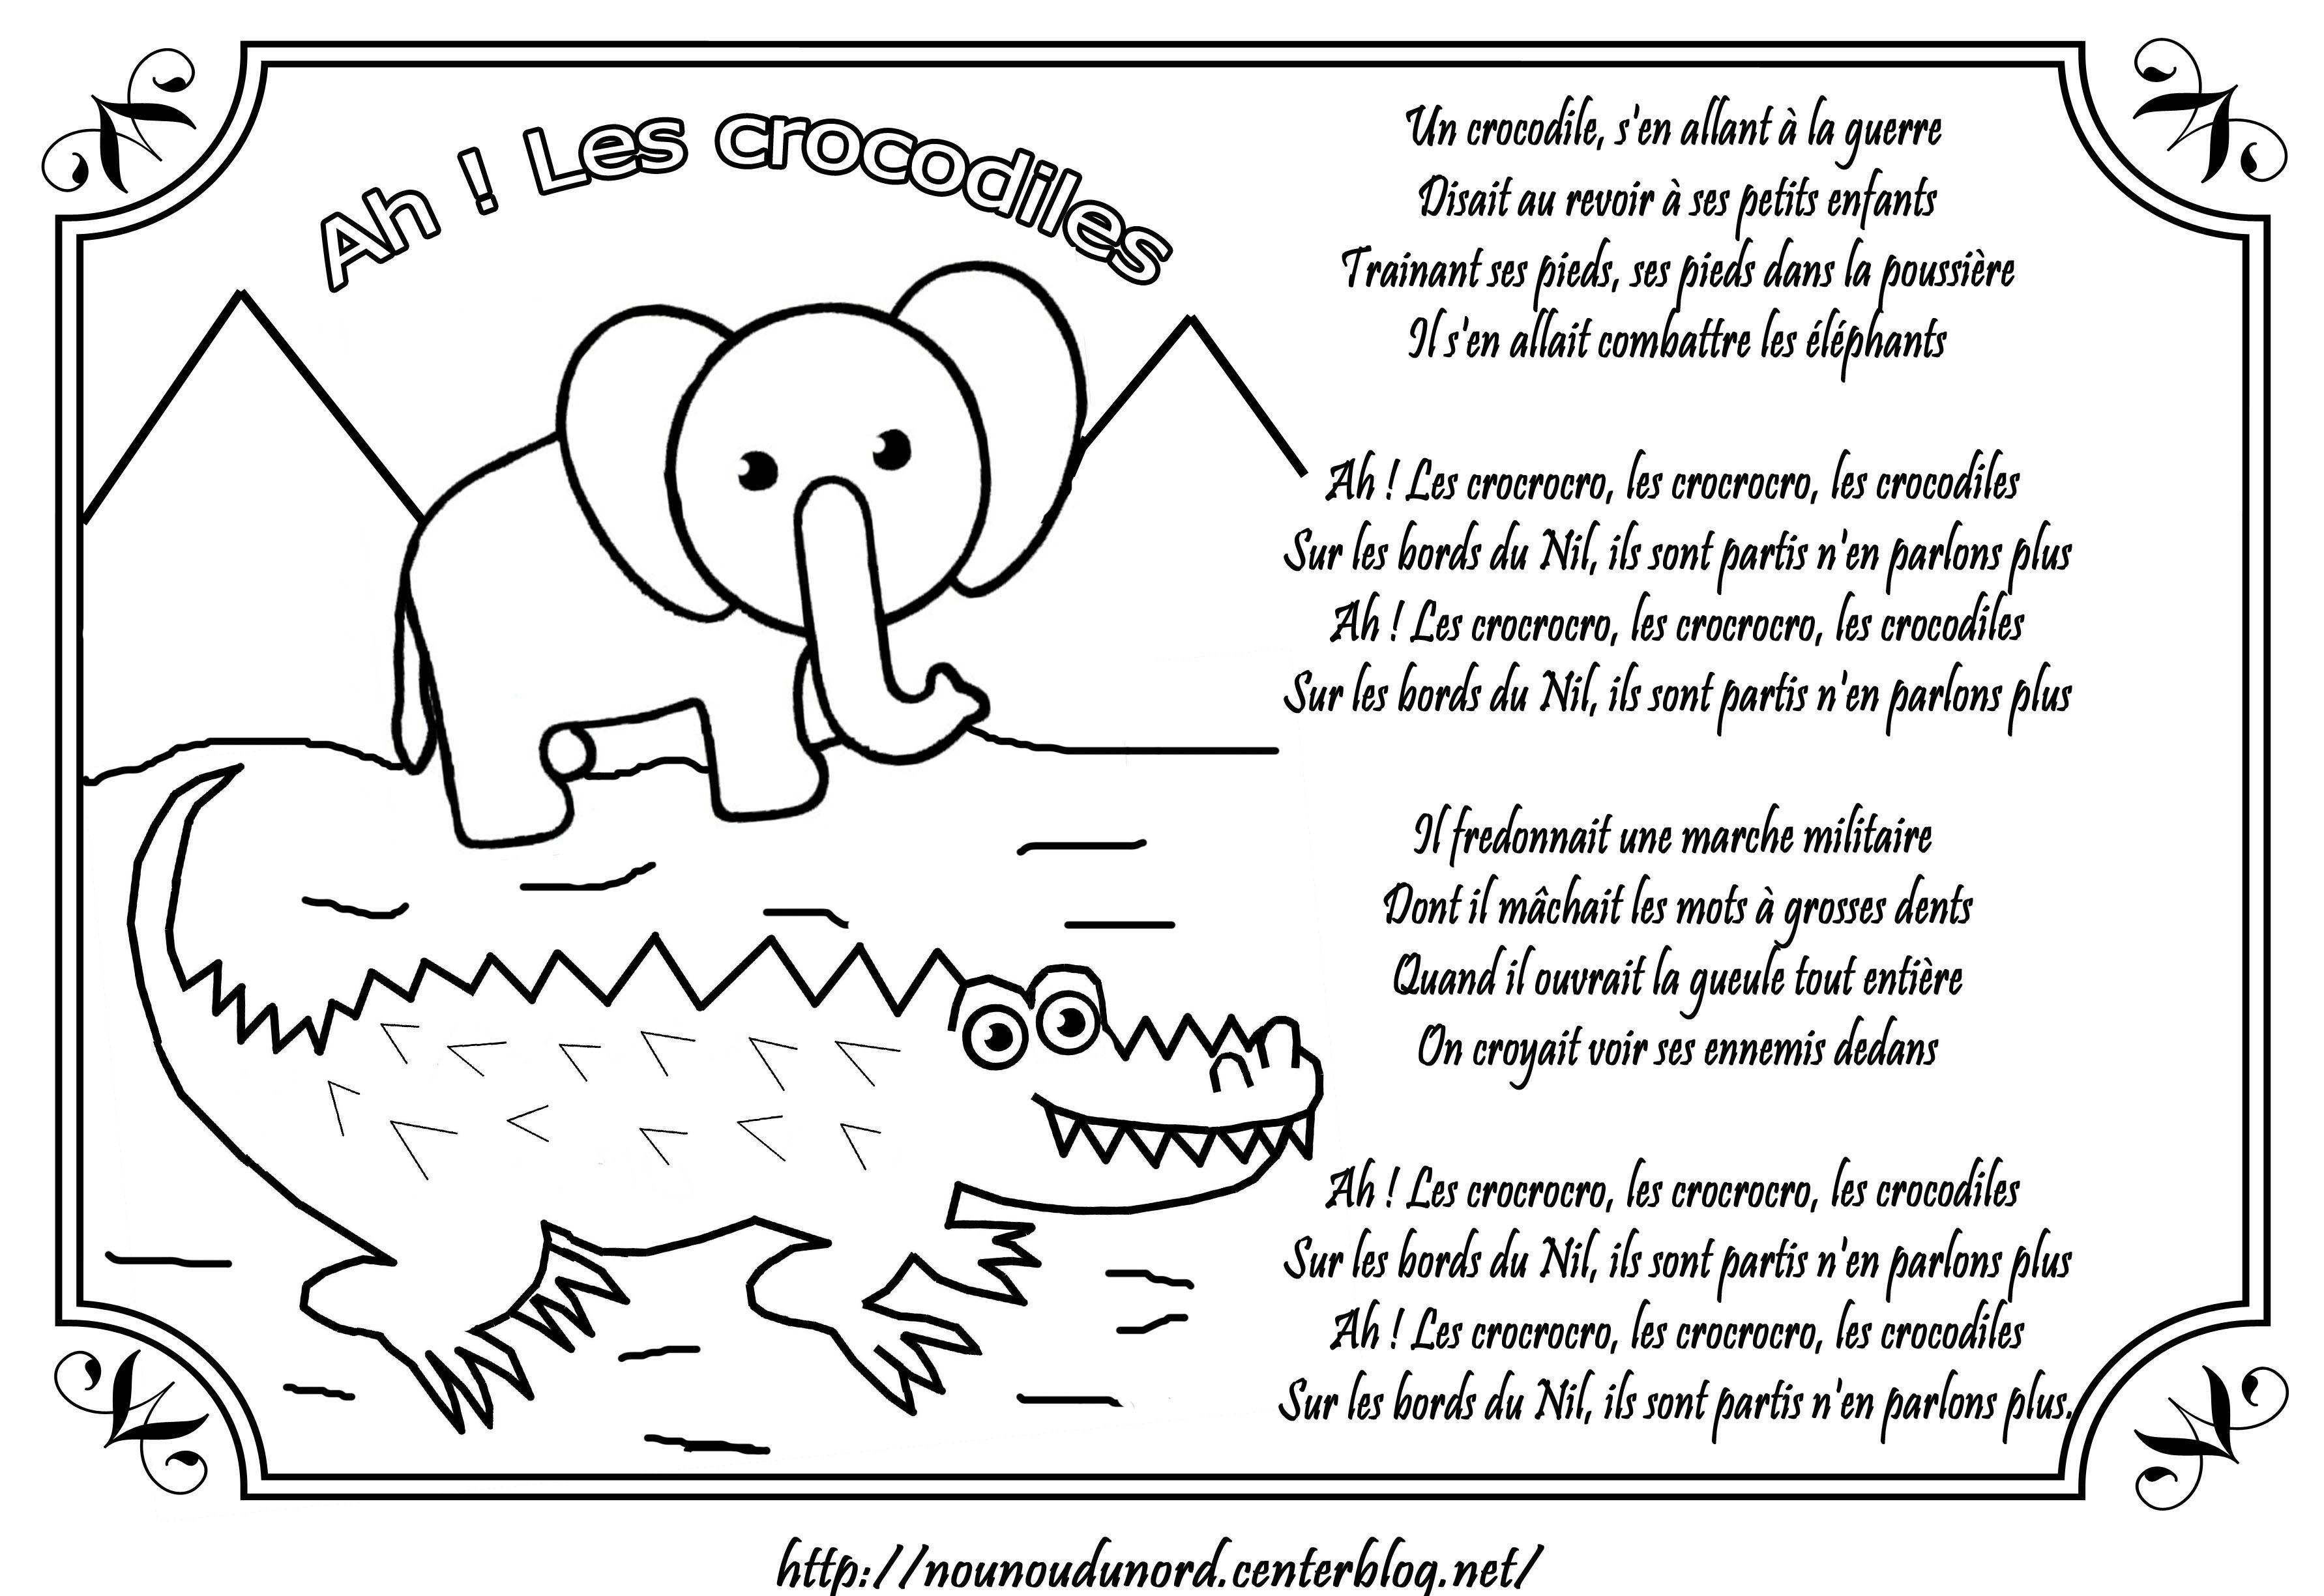 Comptine ah les crocodiles illustr e par nounoudunord - Dessin anime les crocodiles ...